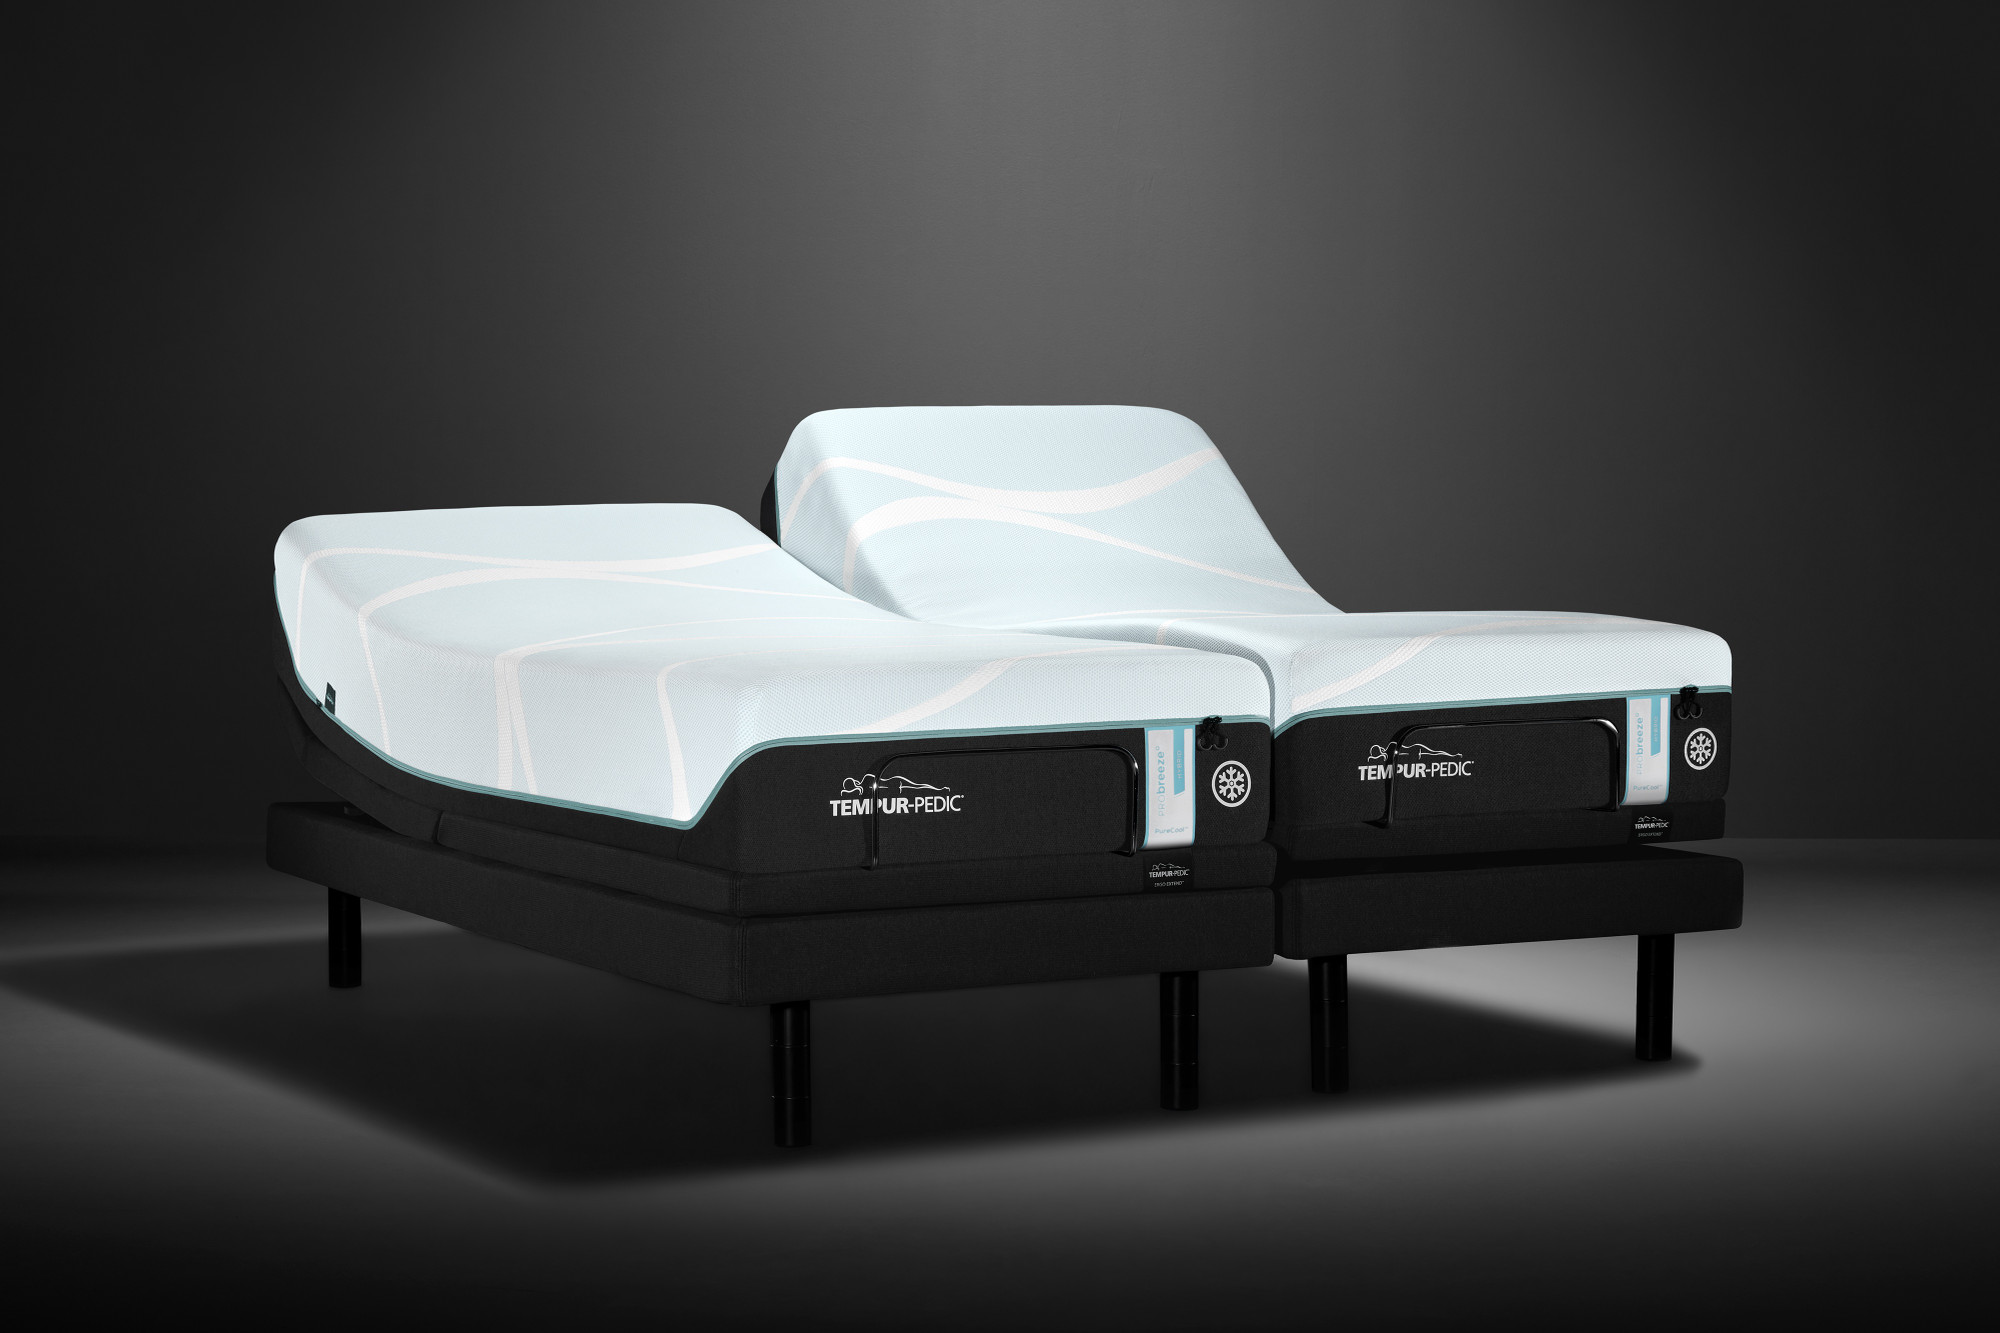 A tempur-probreeze mattress on a split-king tempur-ergo extend adjustable power base